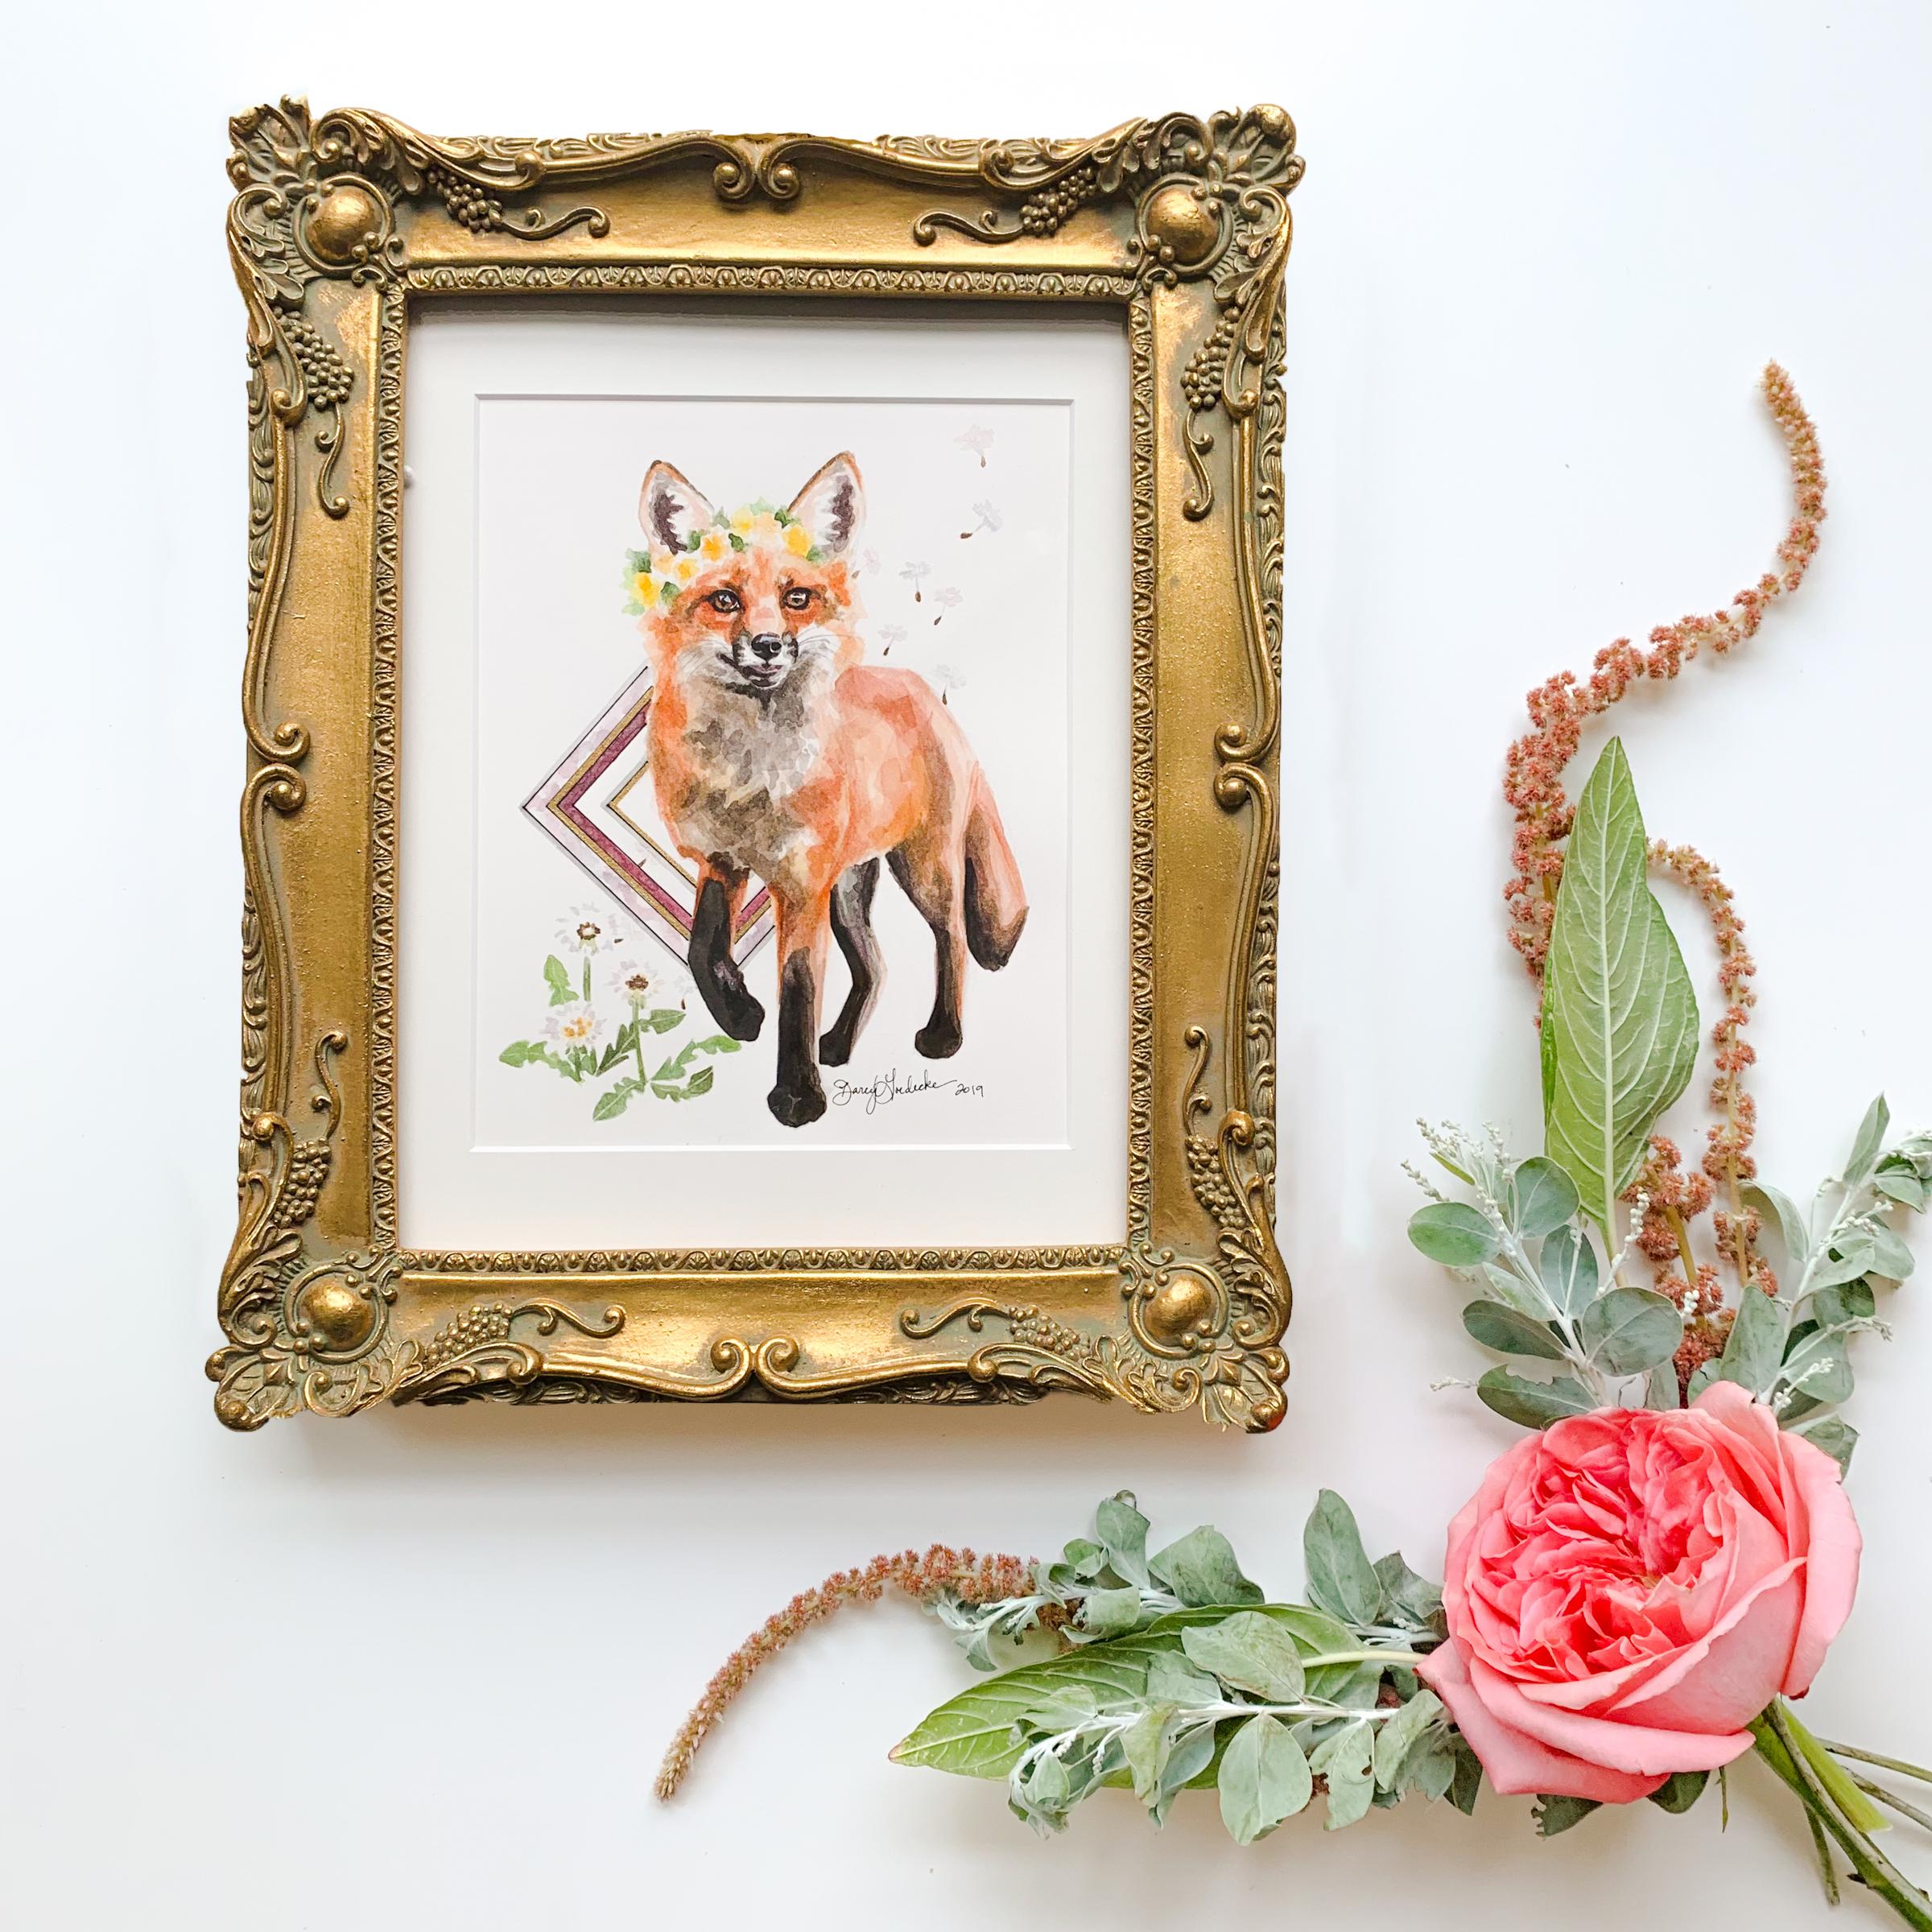 Dandelion Fox by Darcy Goedecke